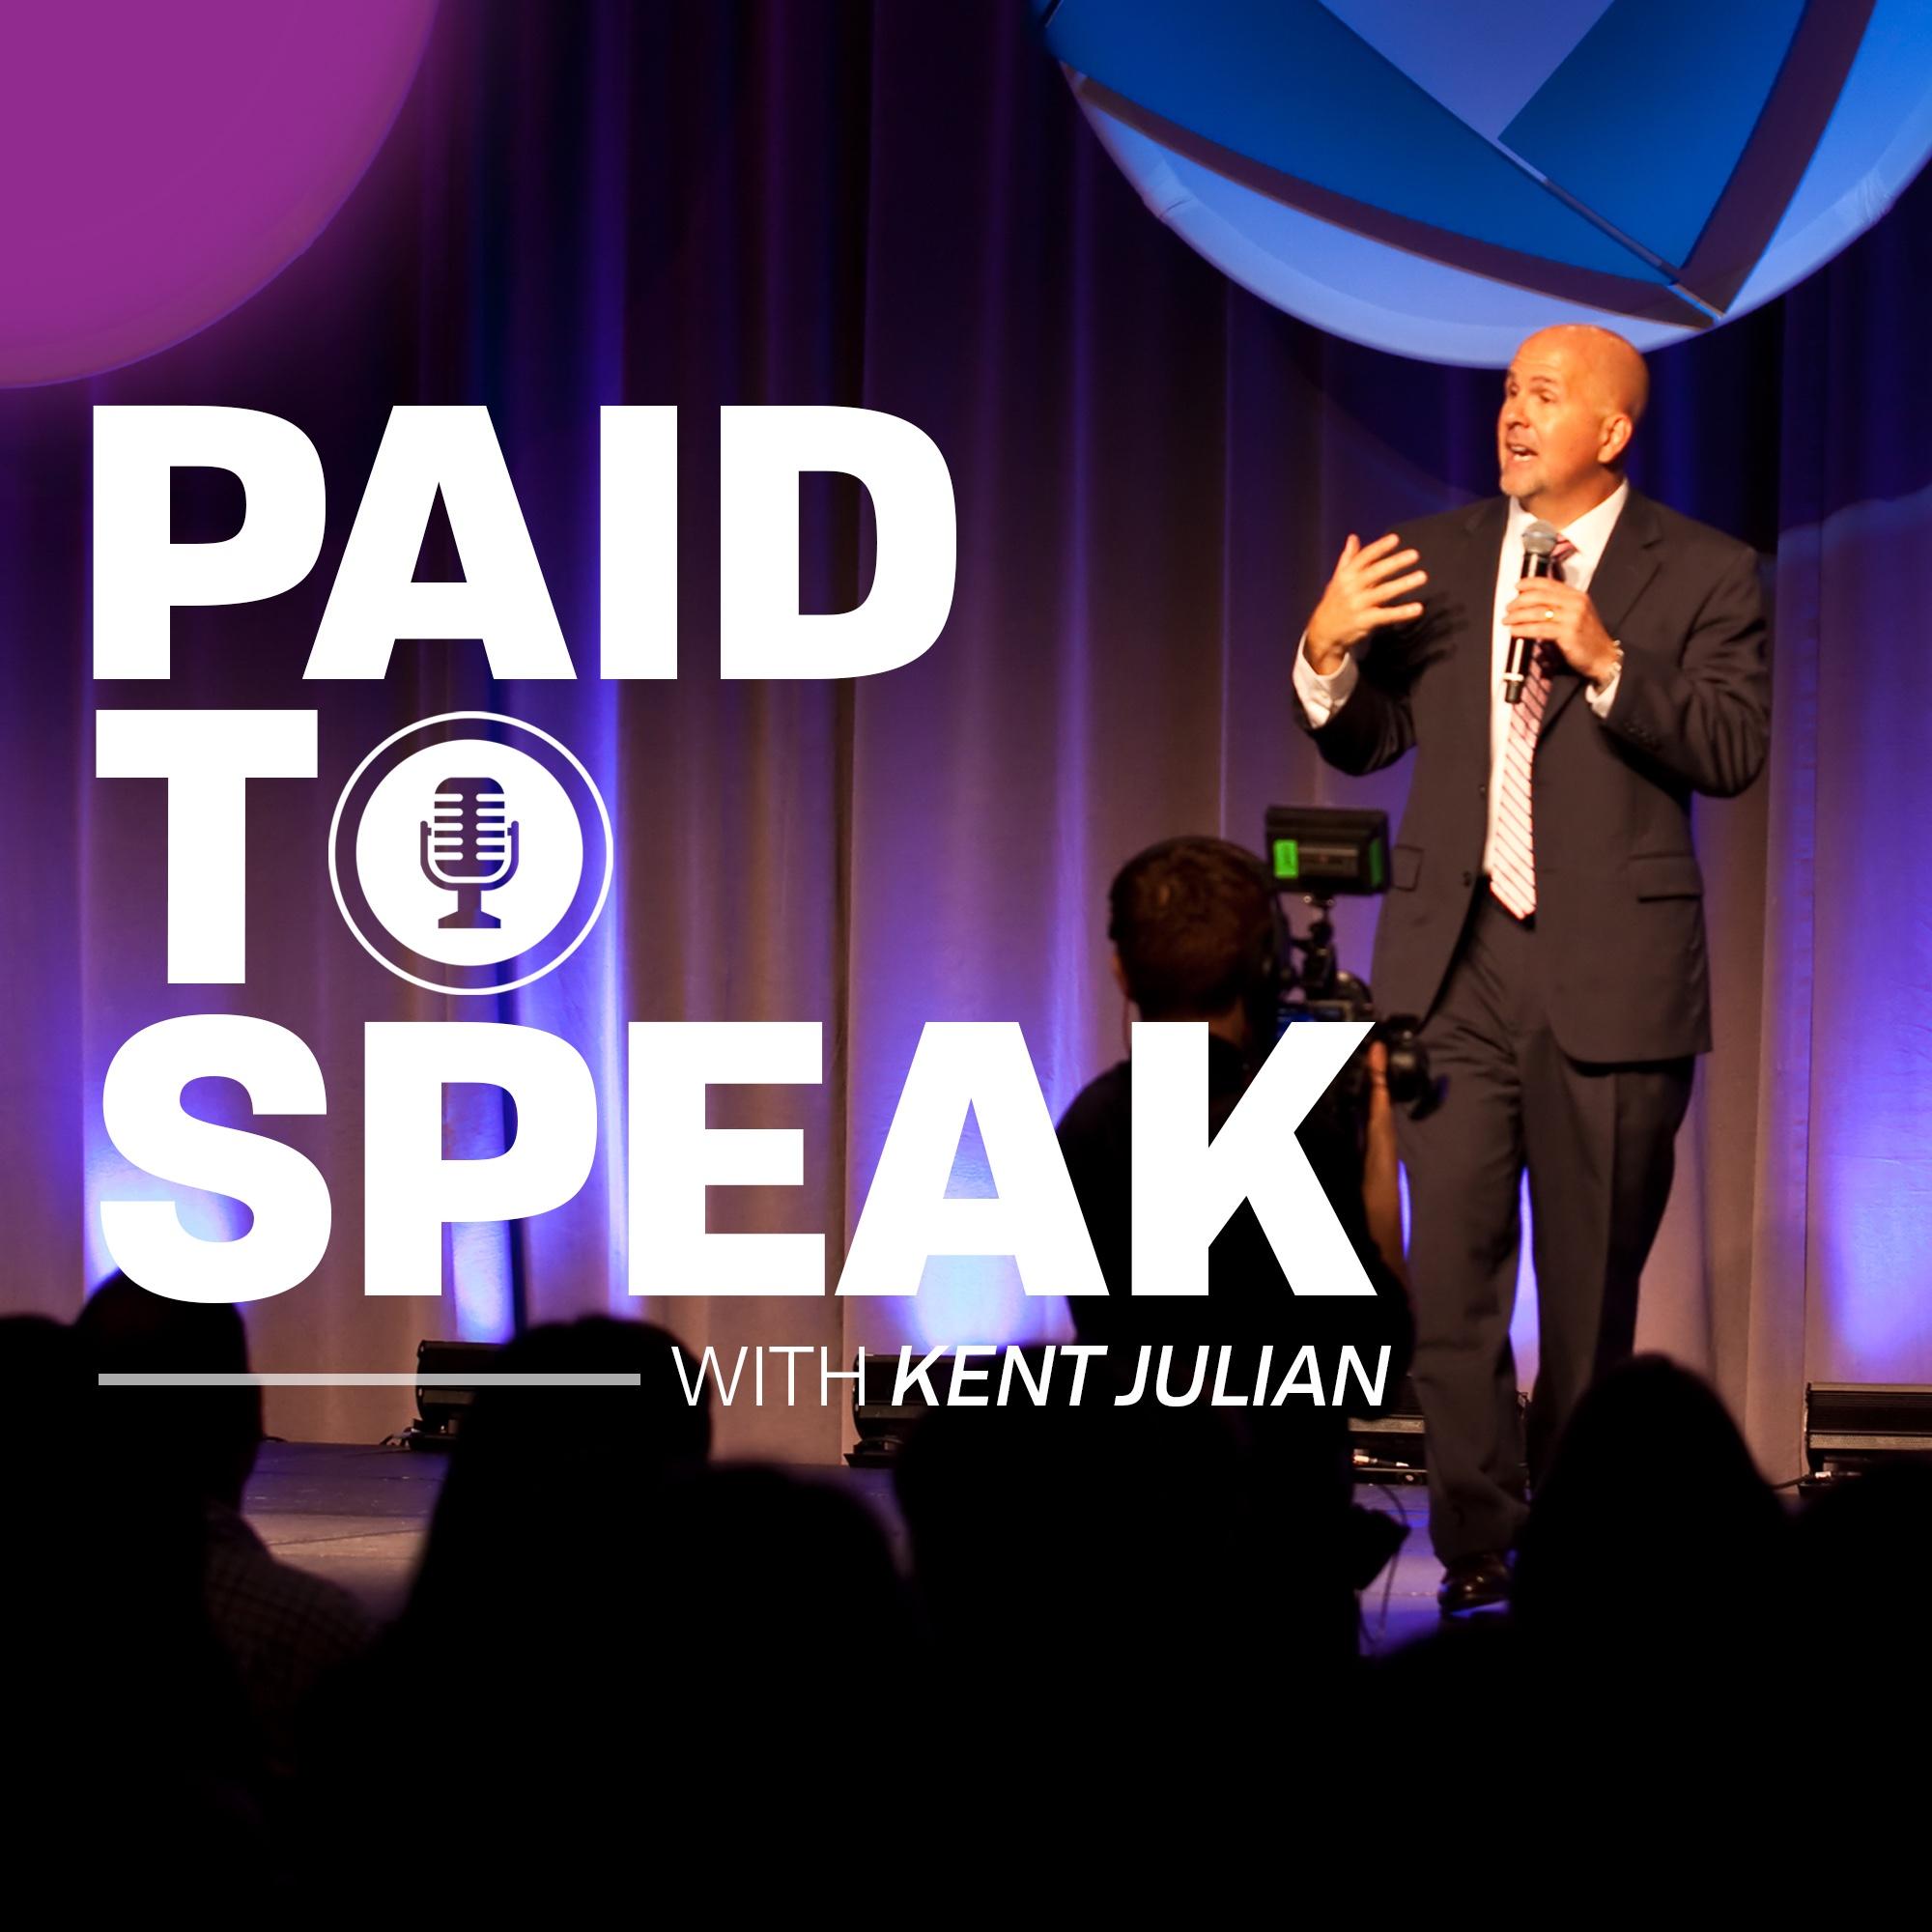 Paid to Speak